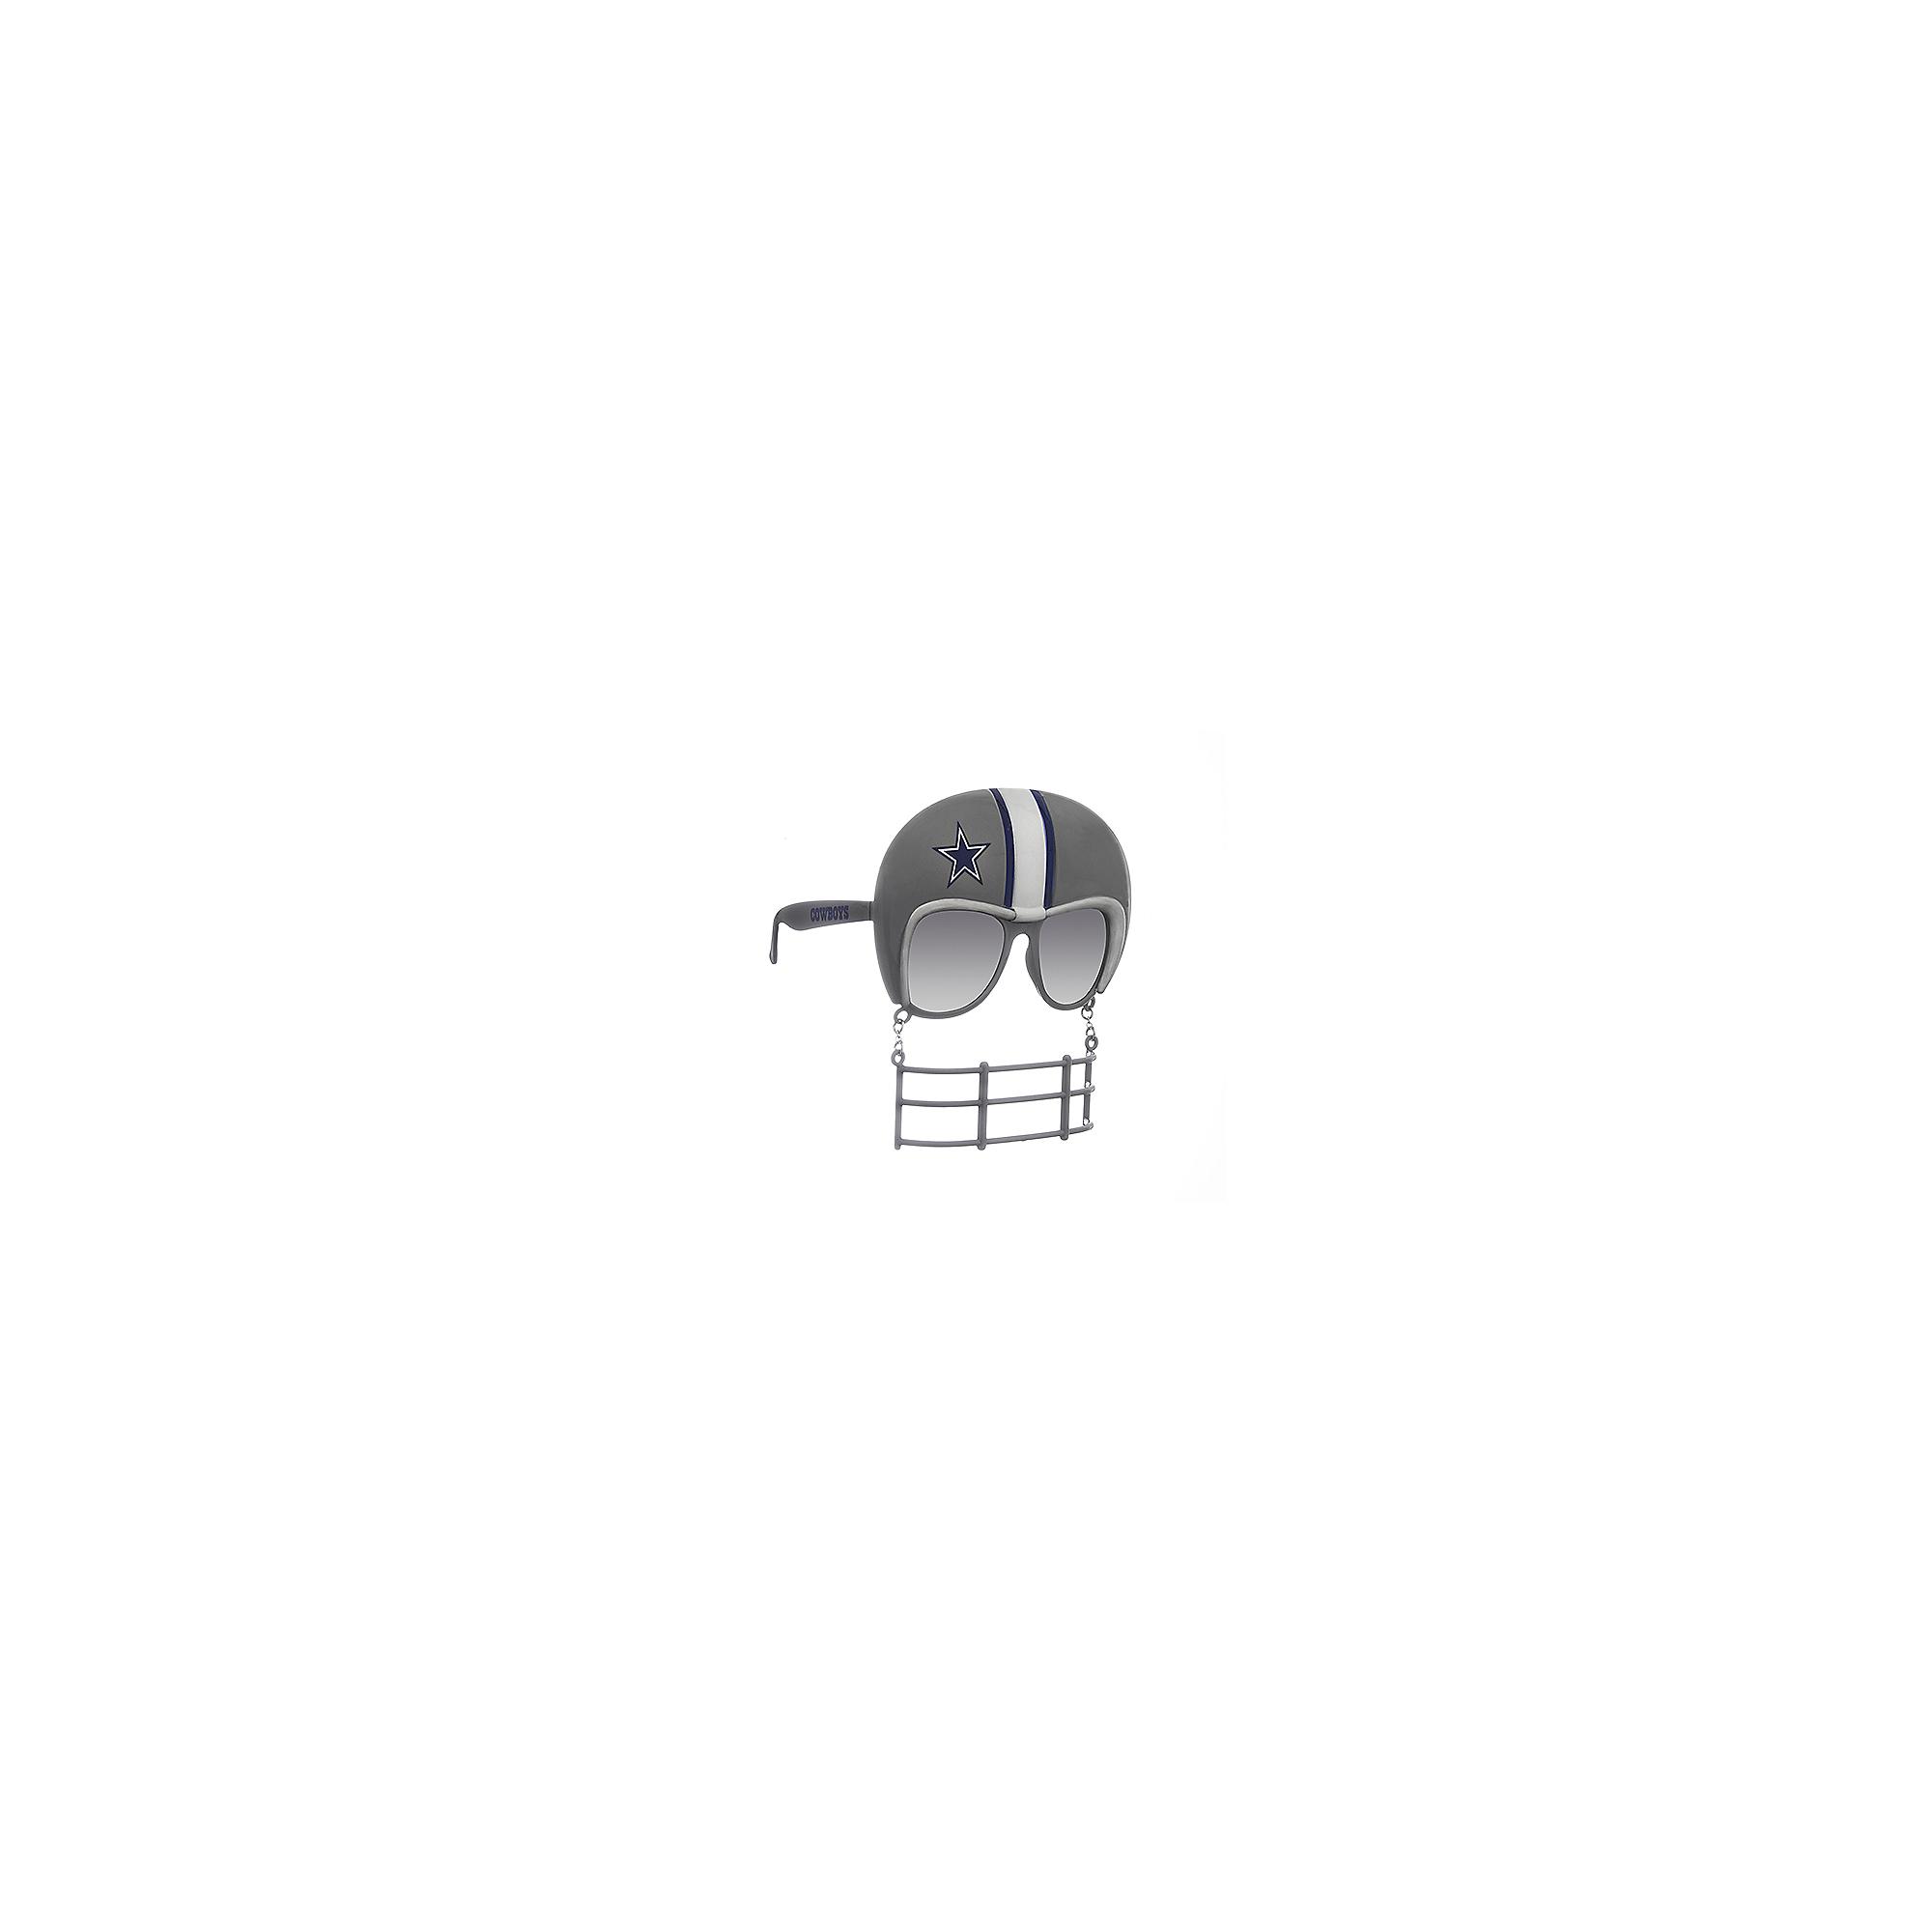 Dallas Cowboys Novelty Face Mask Sunglasses